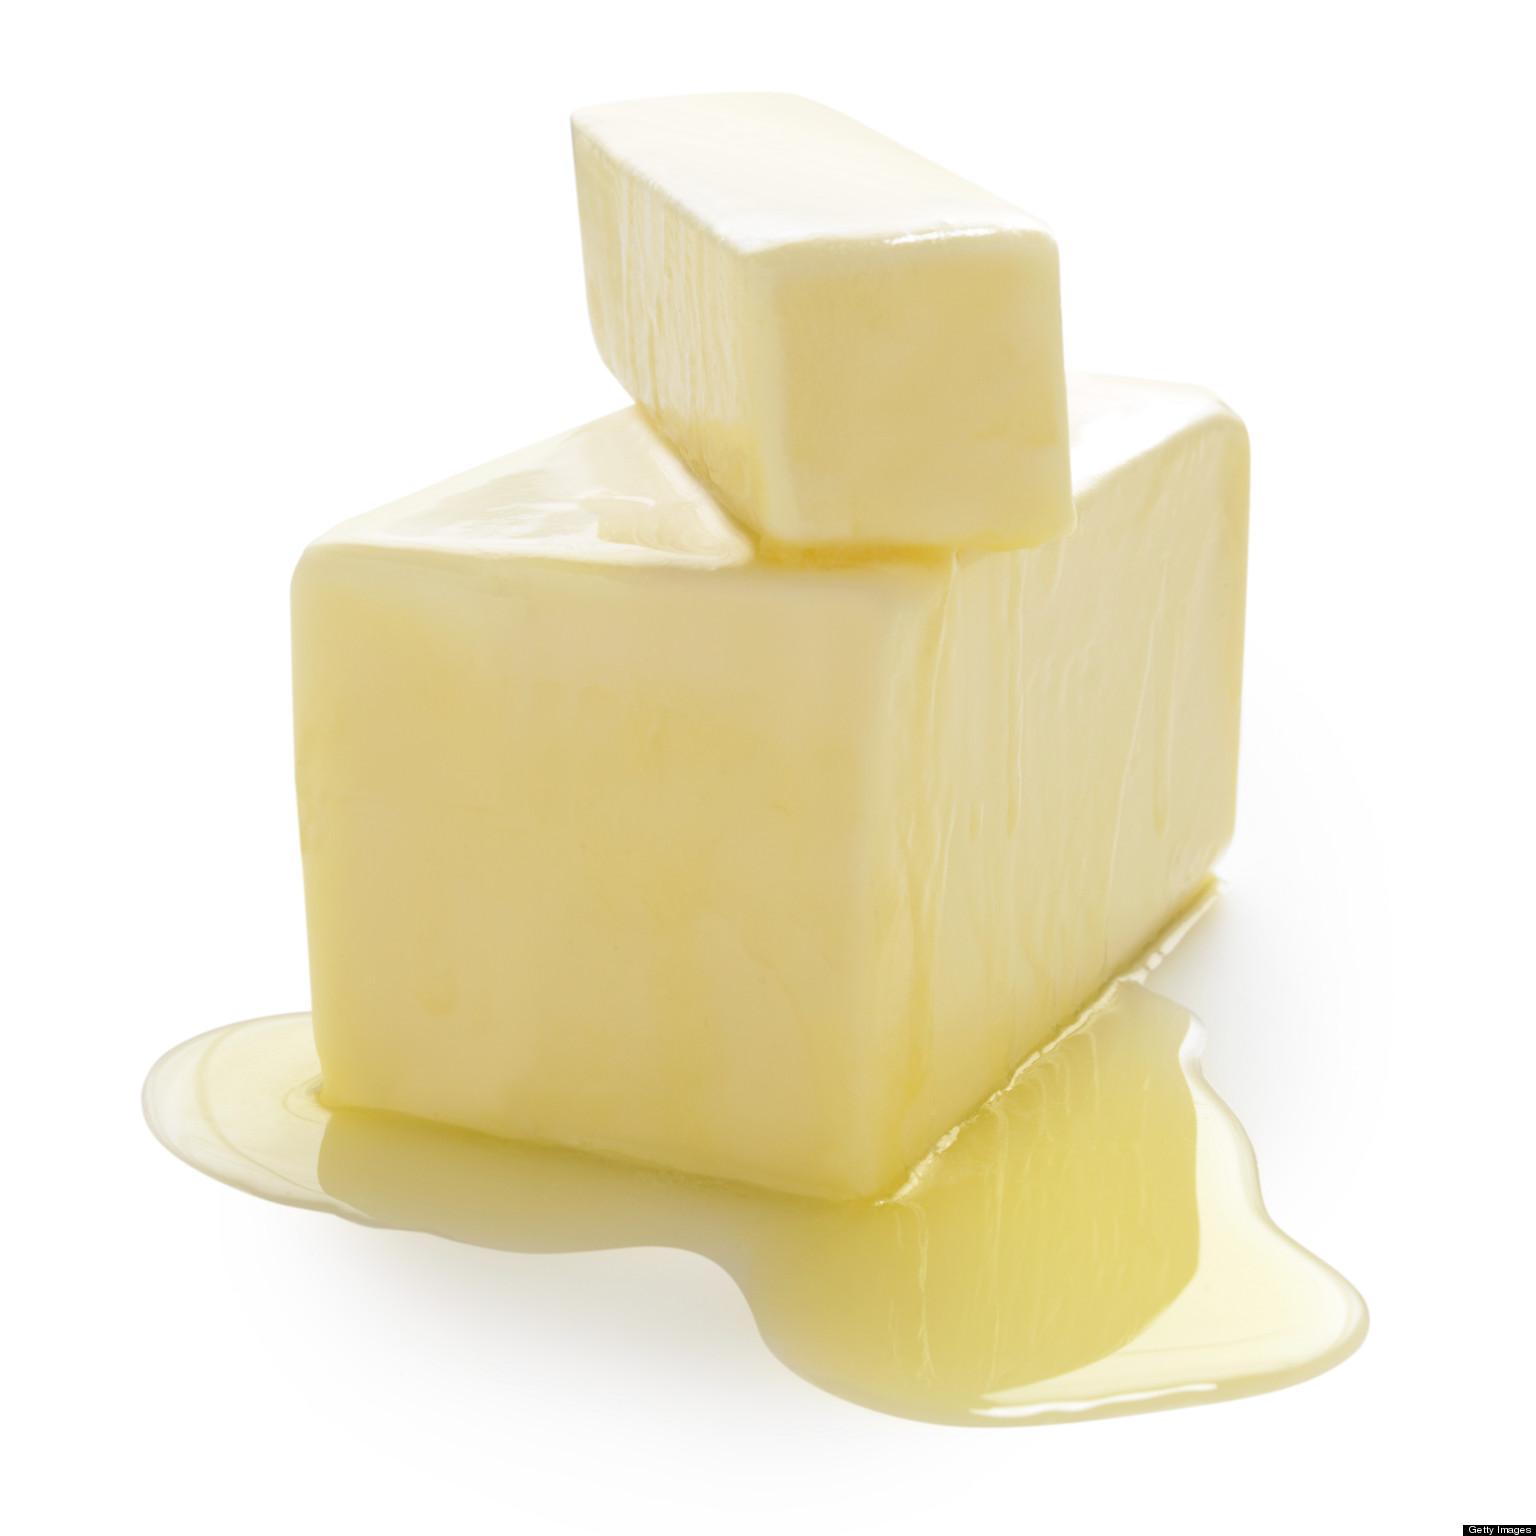 Butter PNG Transparent Butter.PNG Images..